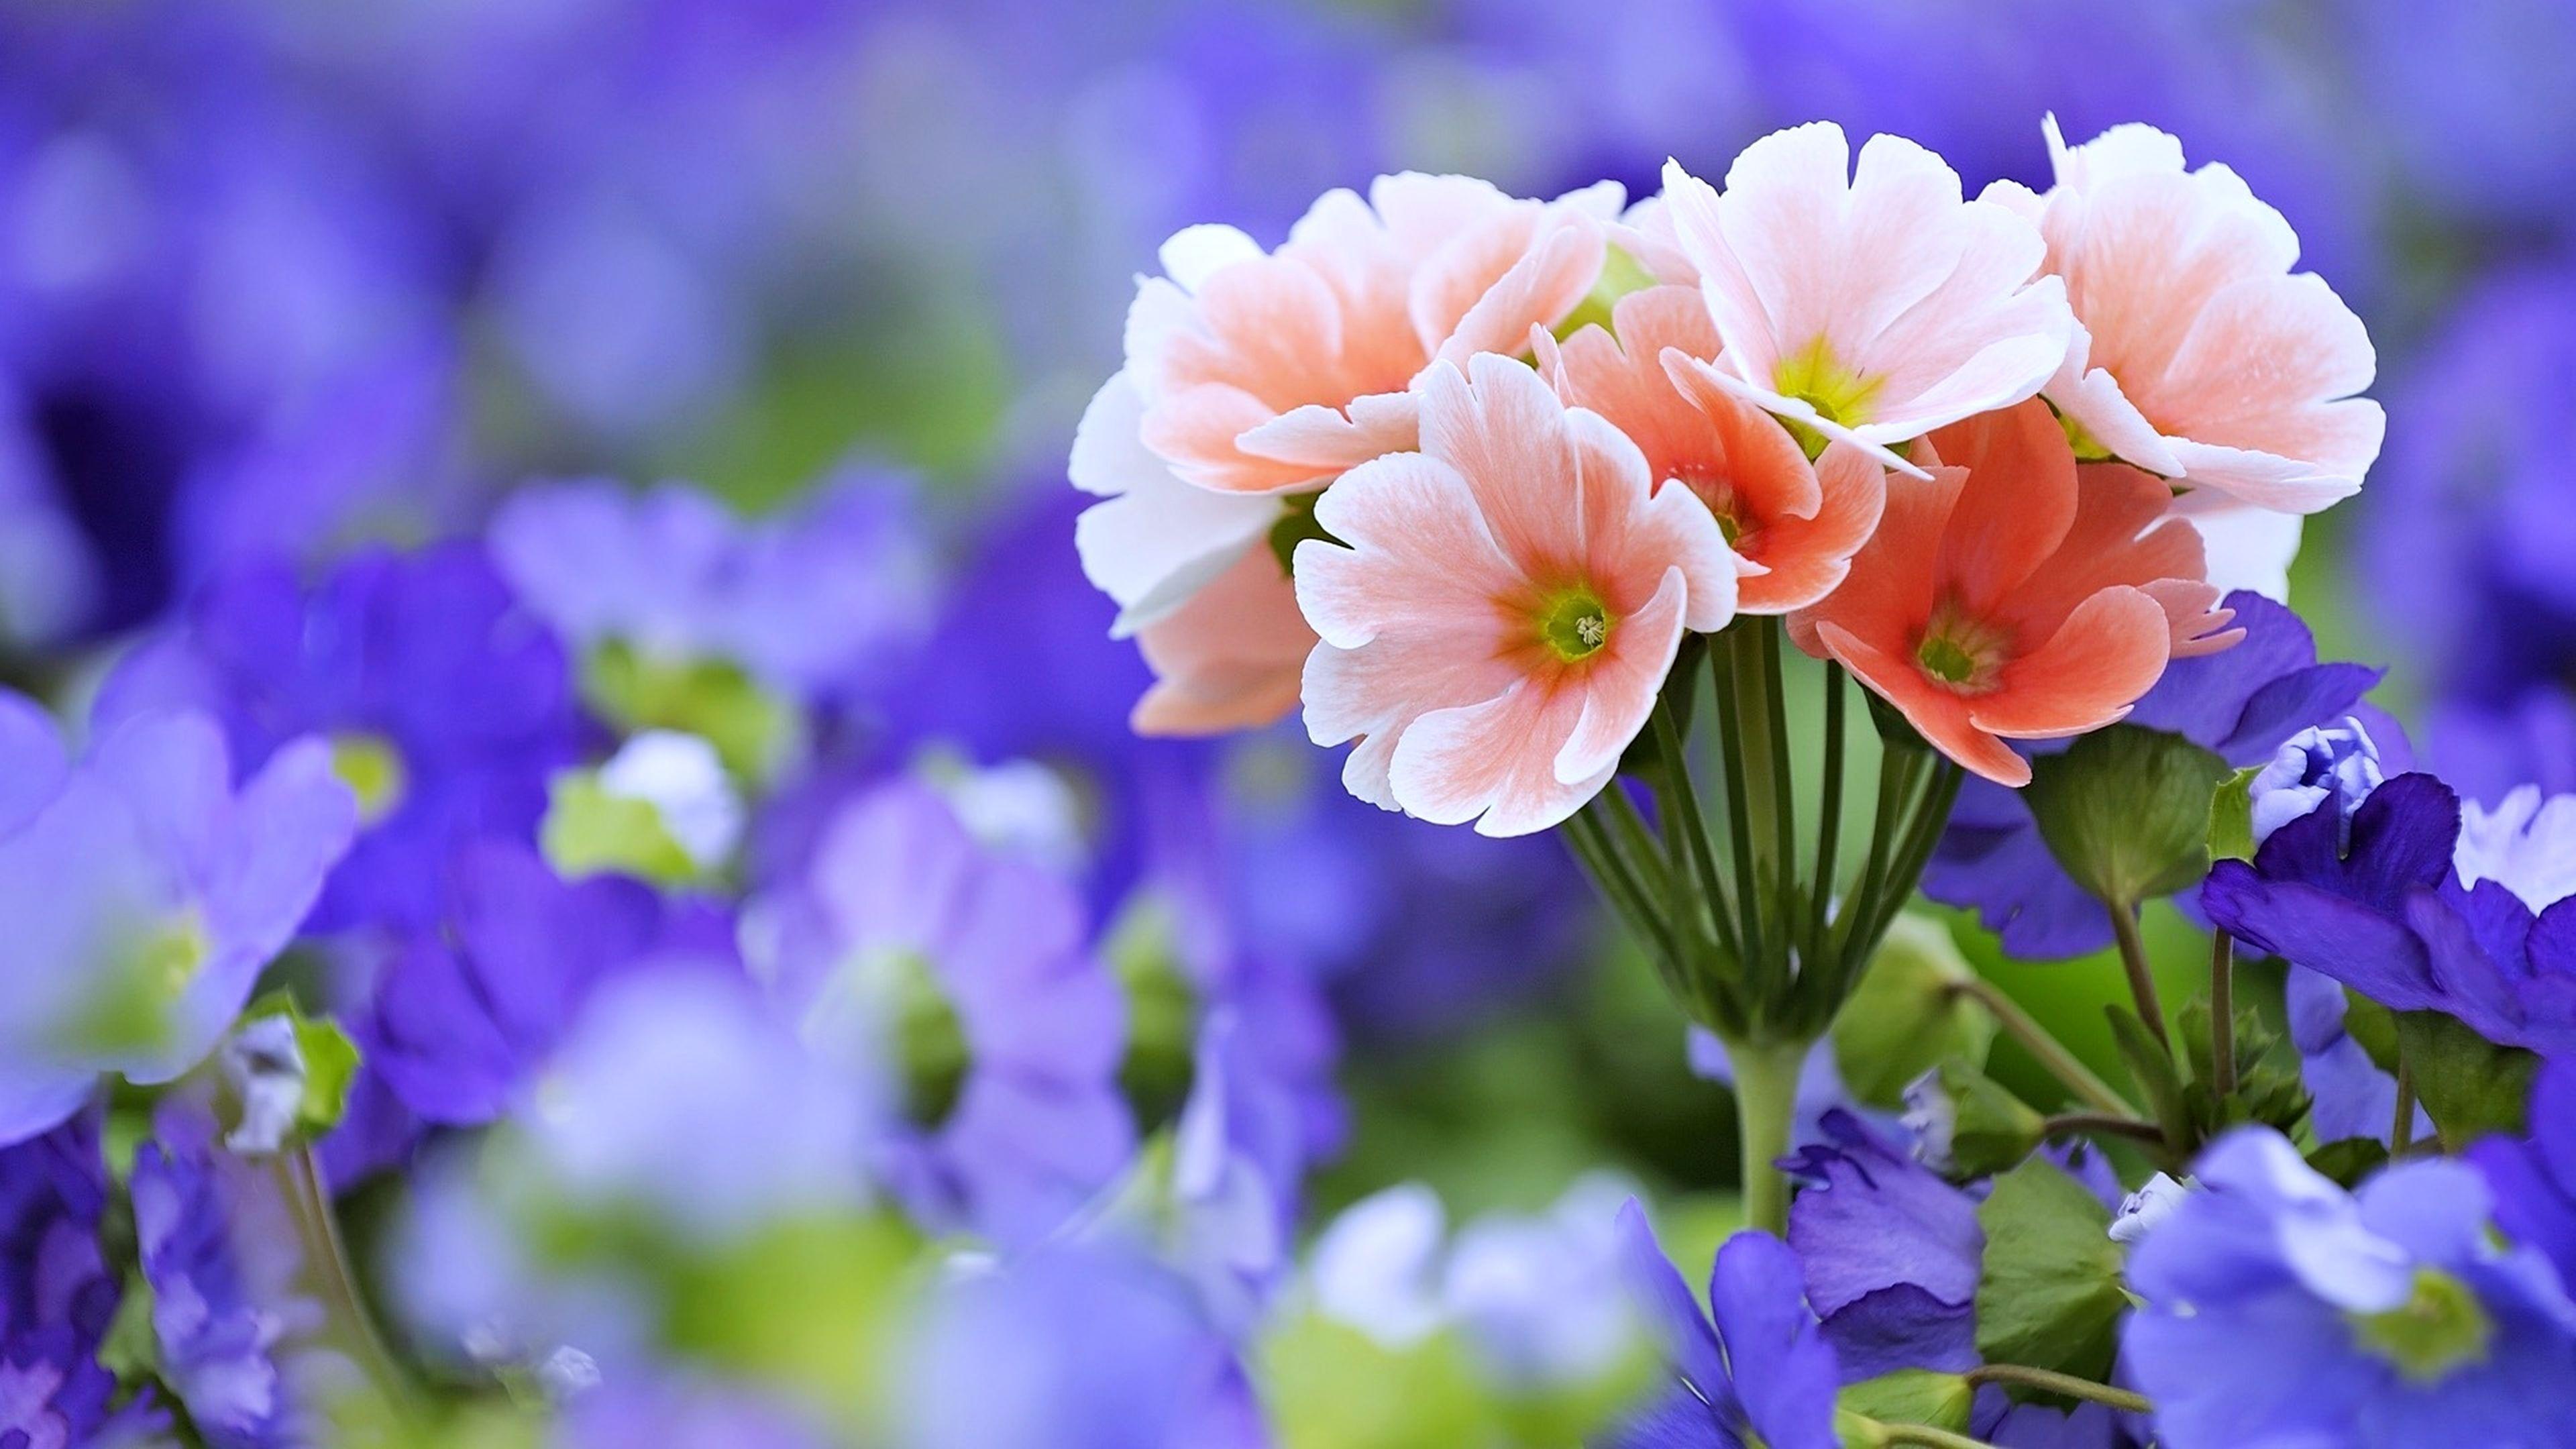 Flower Wallpapers Top Free Flower Backgrounds Wallpaperaccess